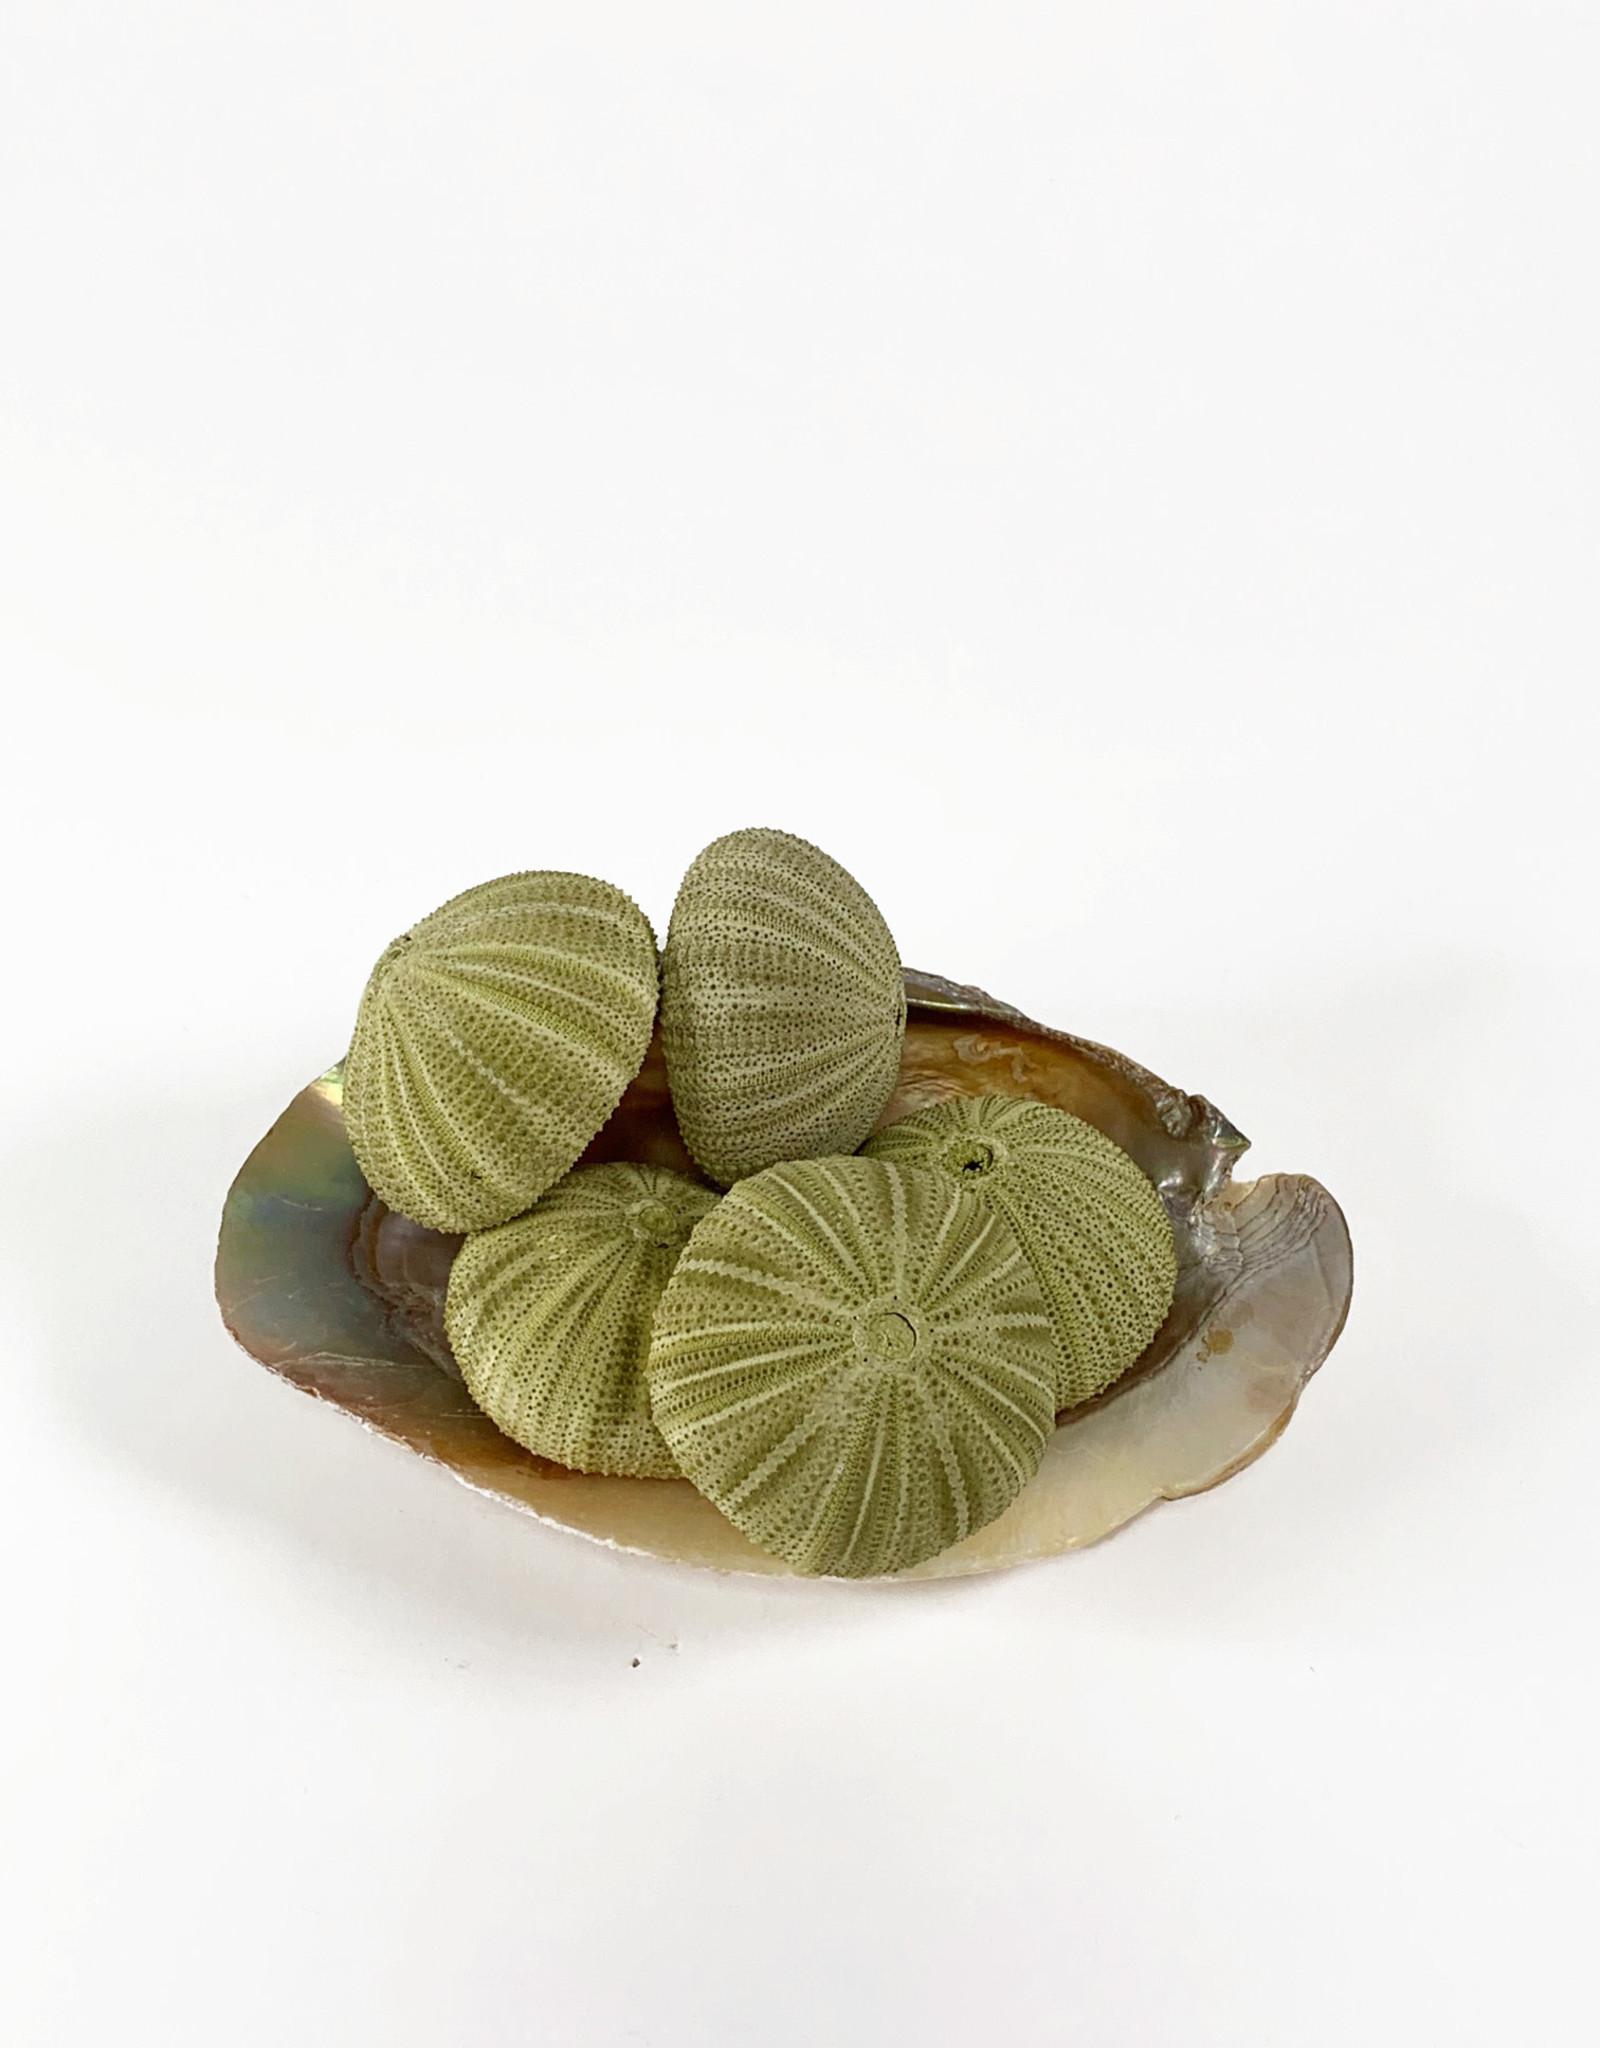 Little green sea urchin